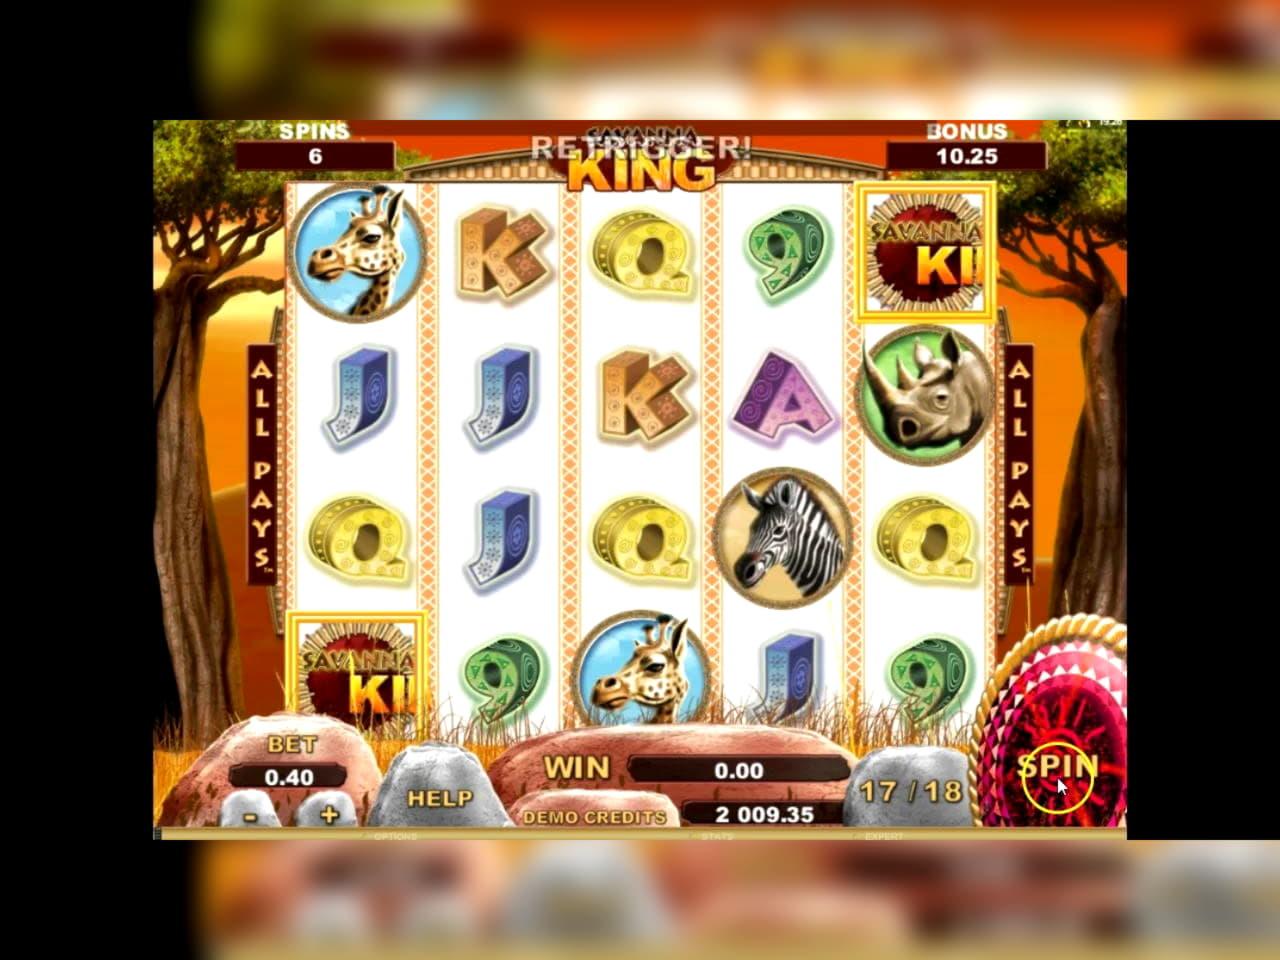 €540 Mobile freeroll slot tournament at William Hill Casino